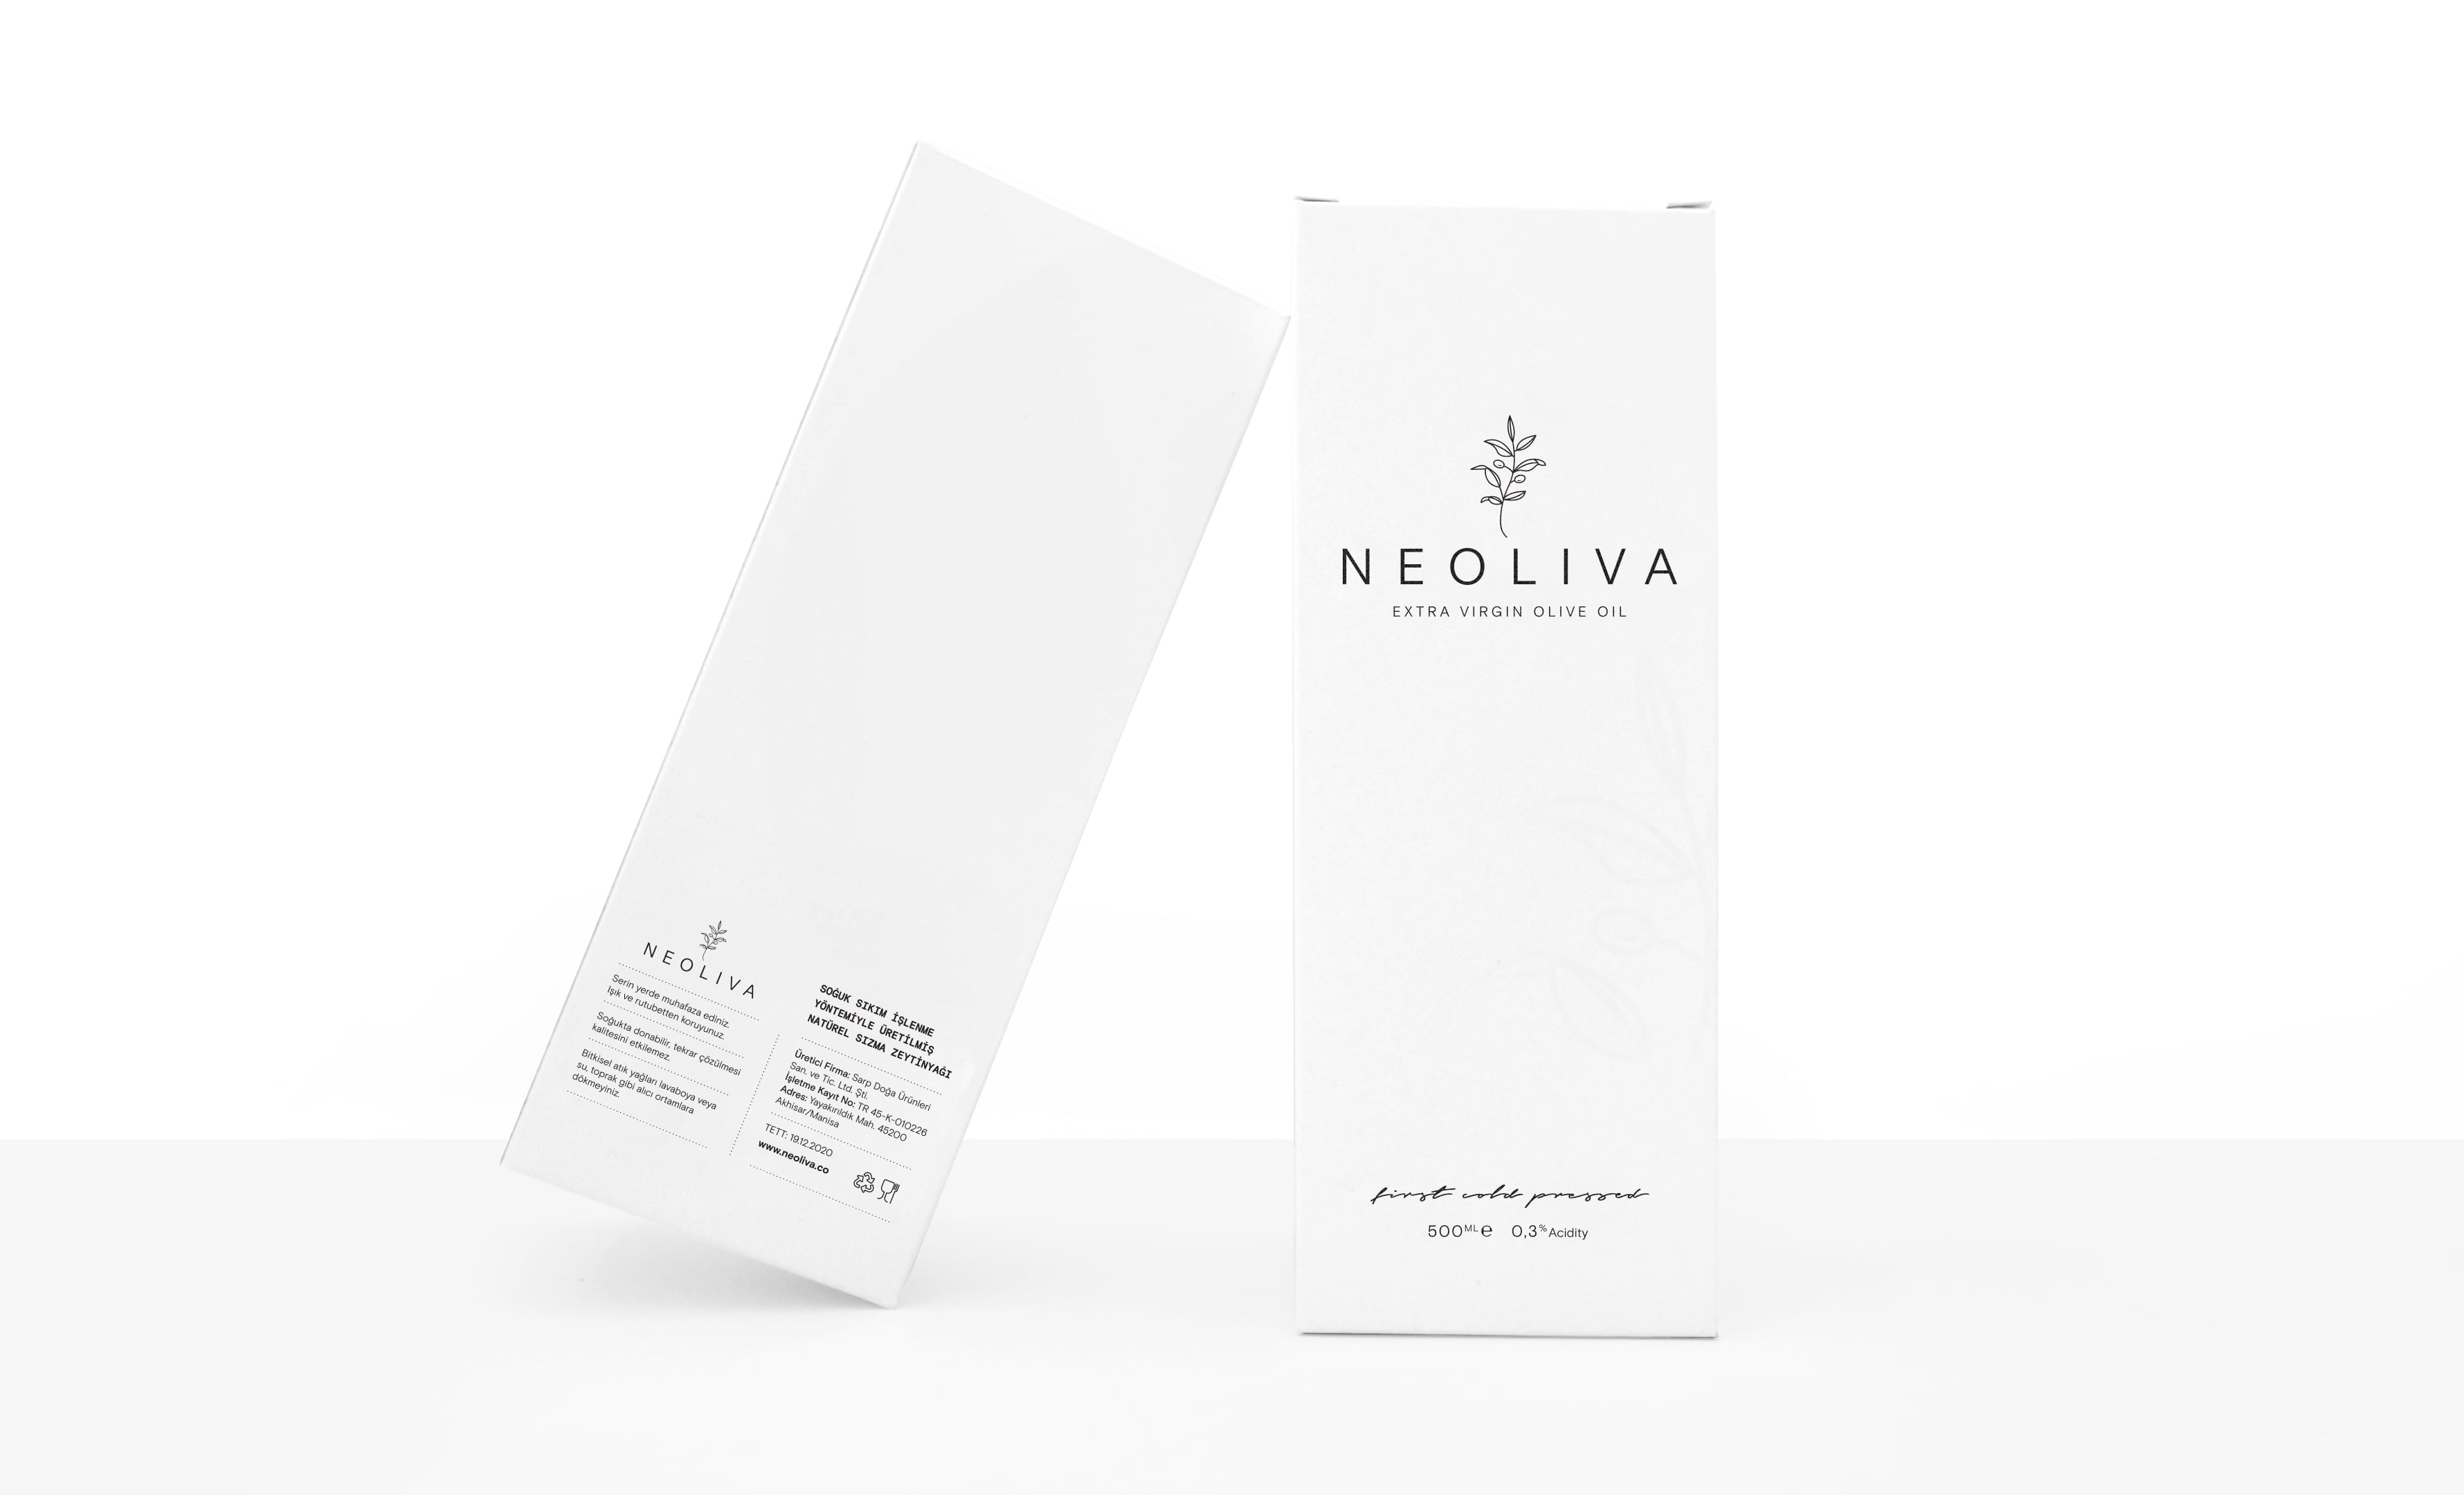 Neoliva-Gokten-Tut-Website-4-1